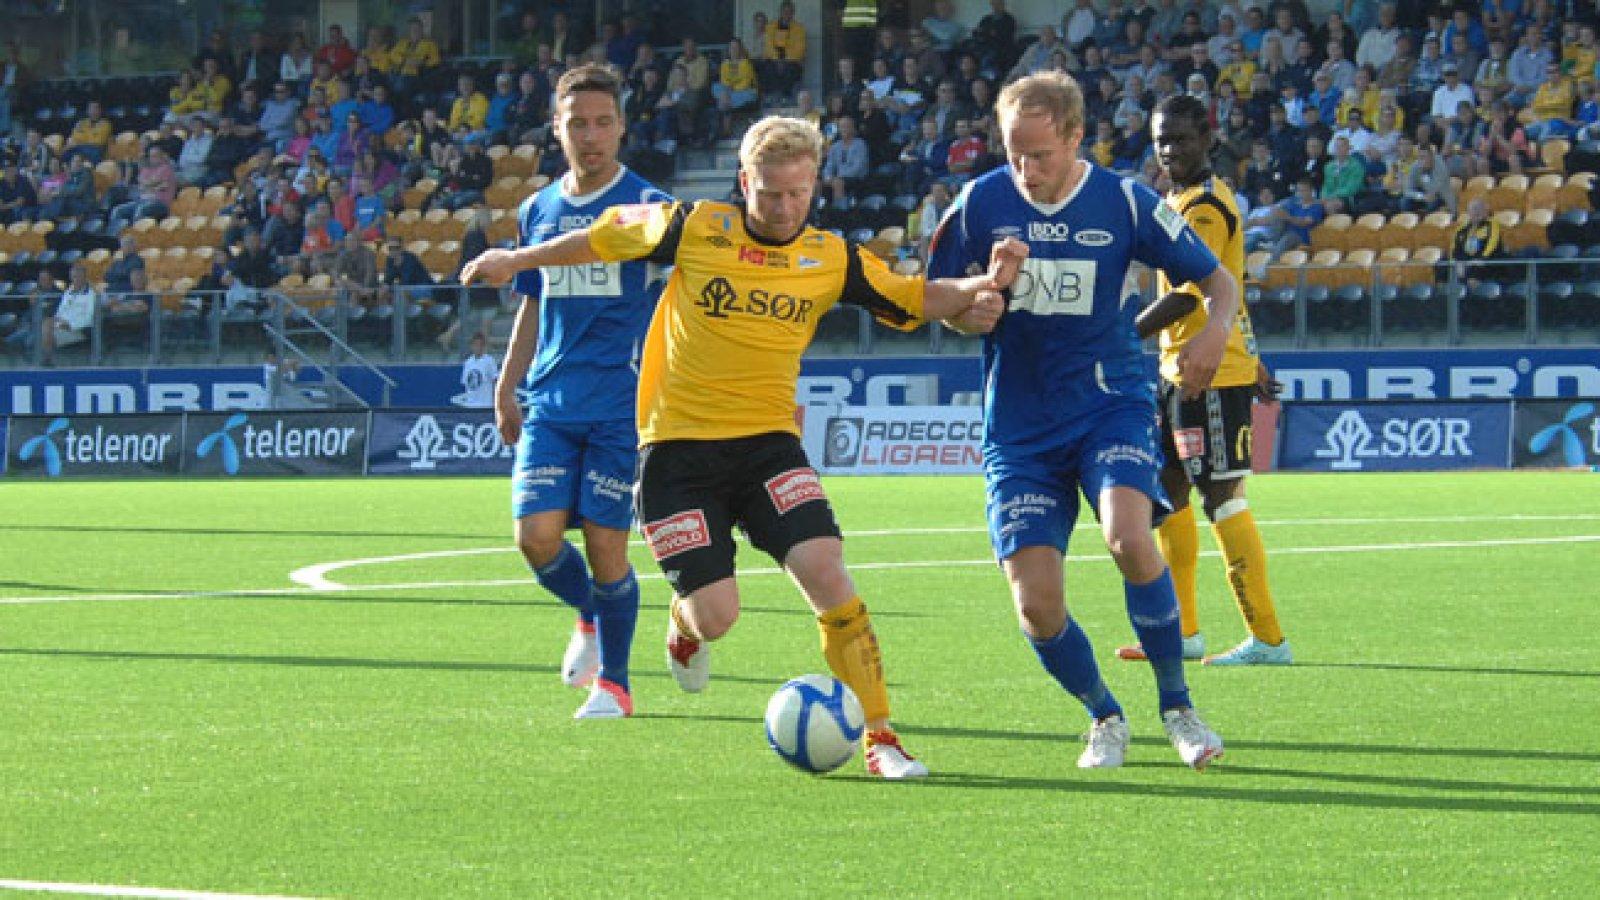 Runde16 Fredrik Strømstad